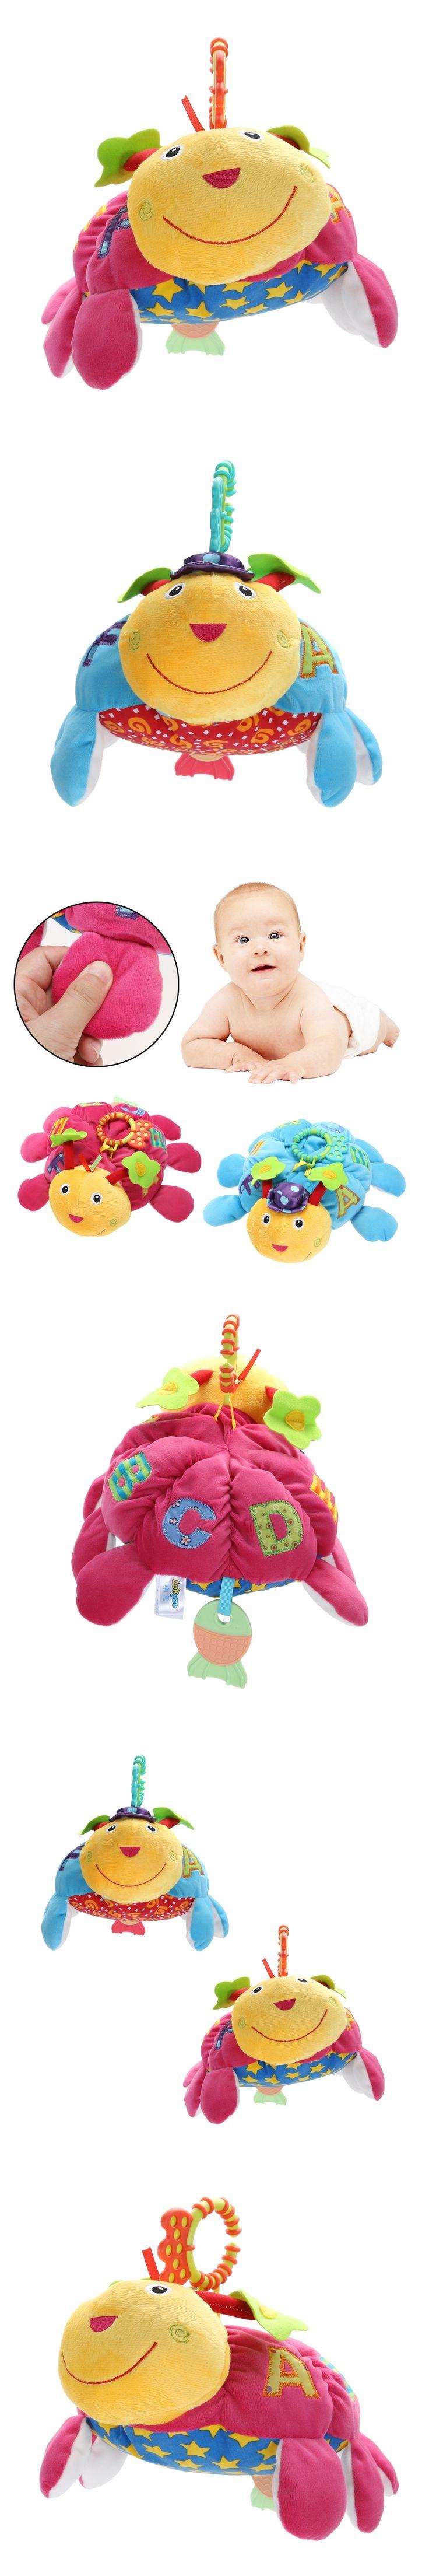 Baby Plush Bed Bell Toy Handbell Doll Turtle Tortoise Handbells Teether Baby Stroller Accessories Hanging Developmental Toys